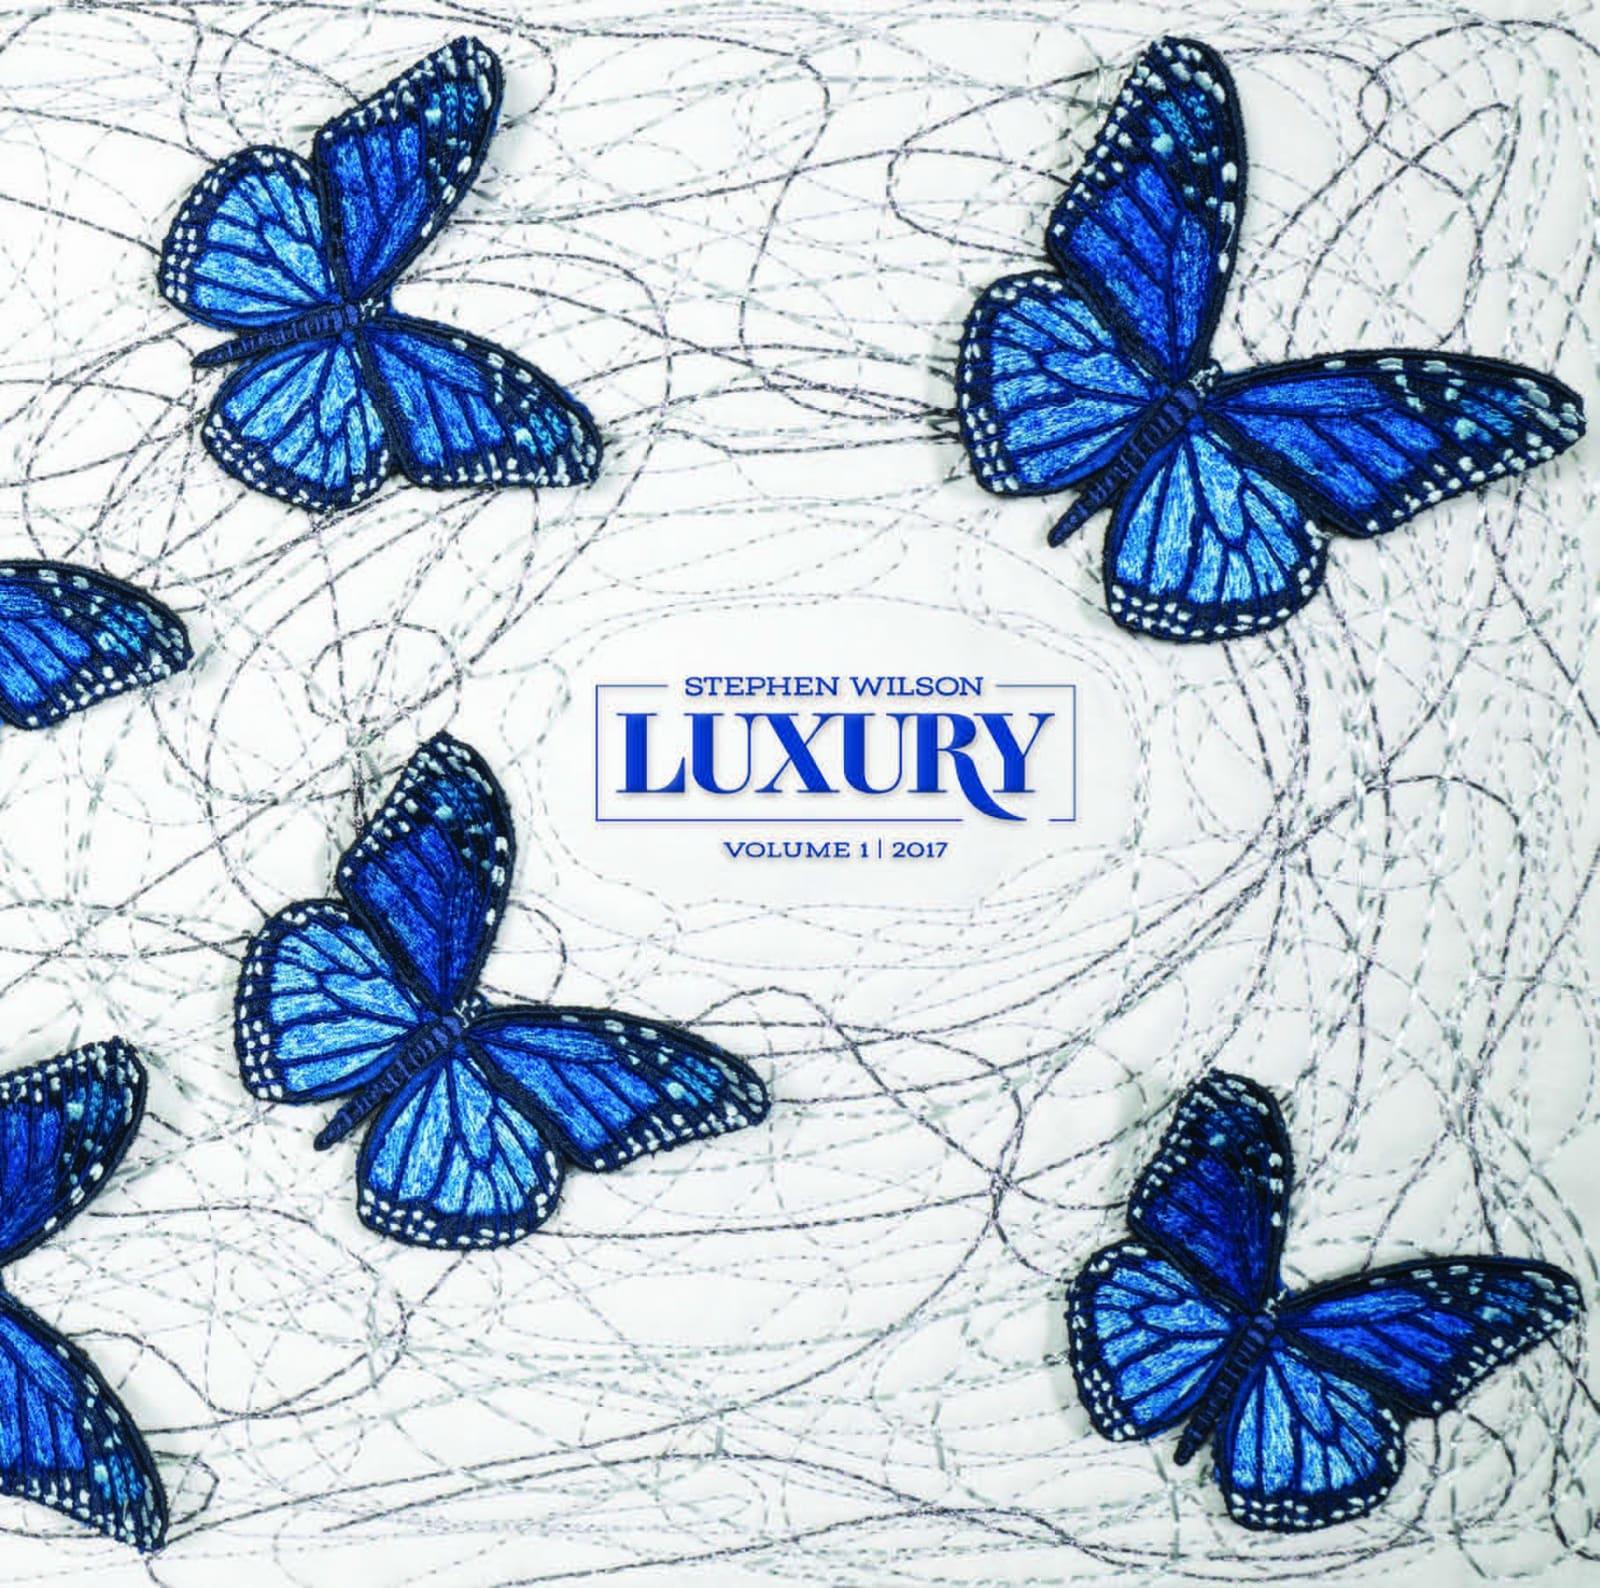 Luxury Volume 1 Studio Publication